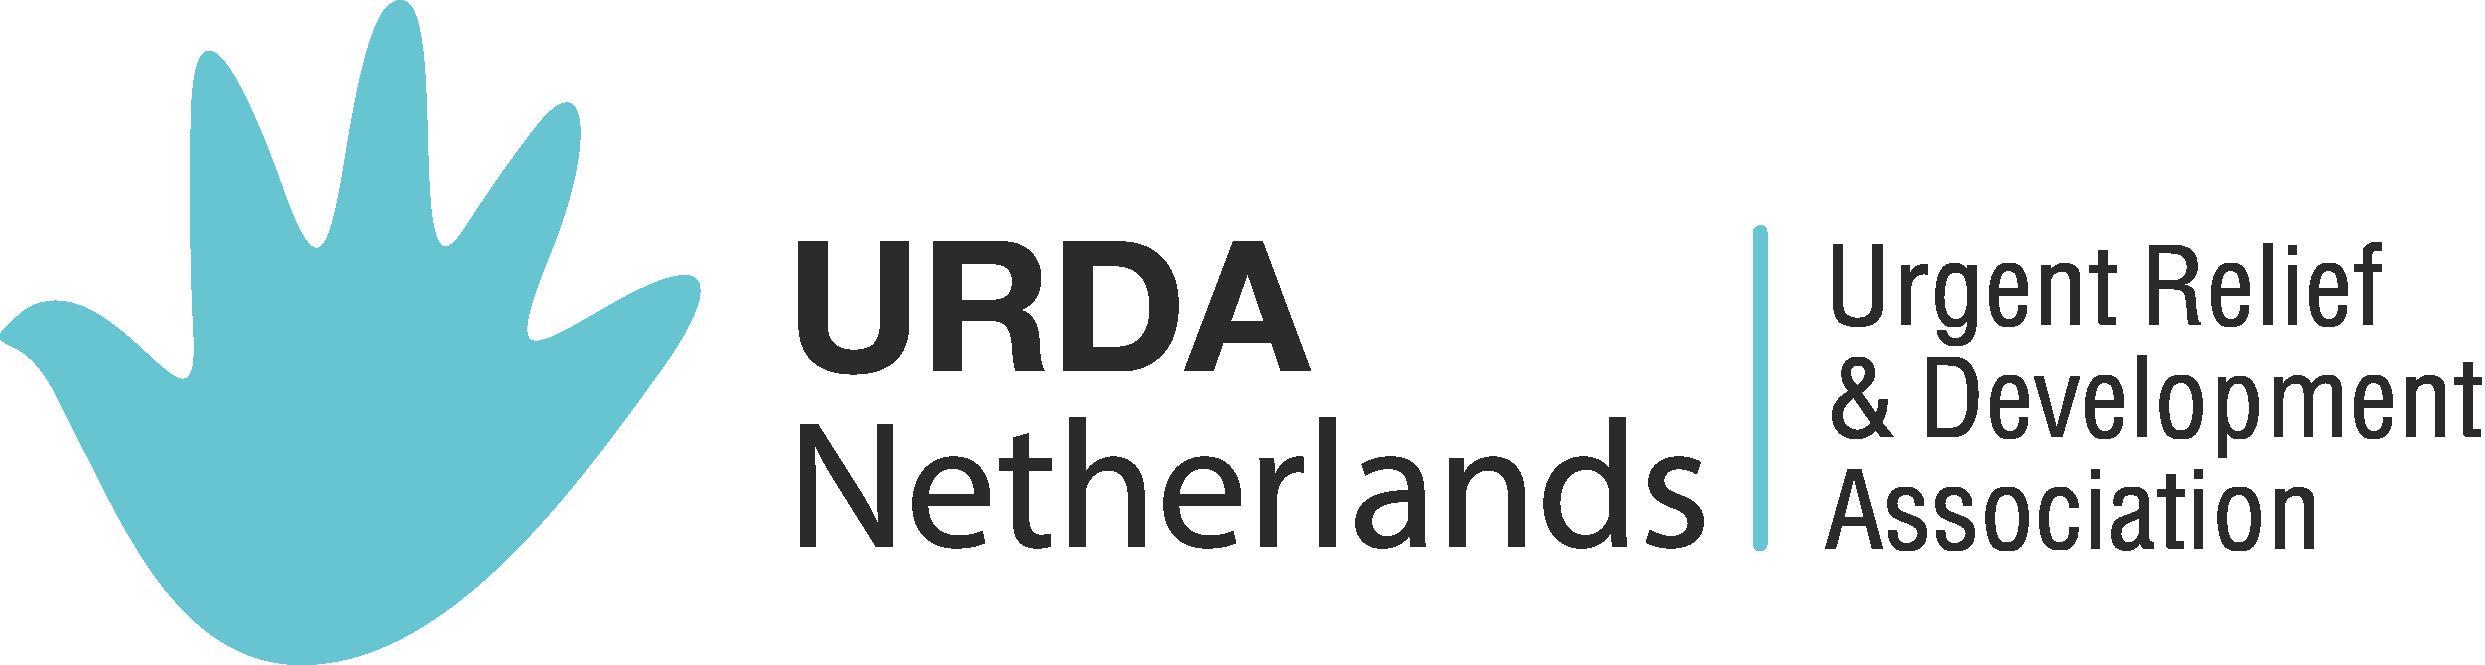 URDA Netherlands